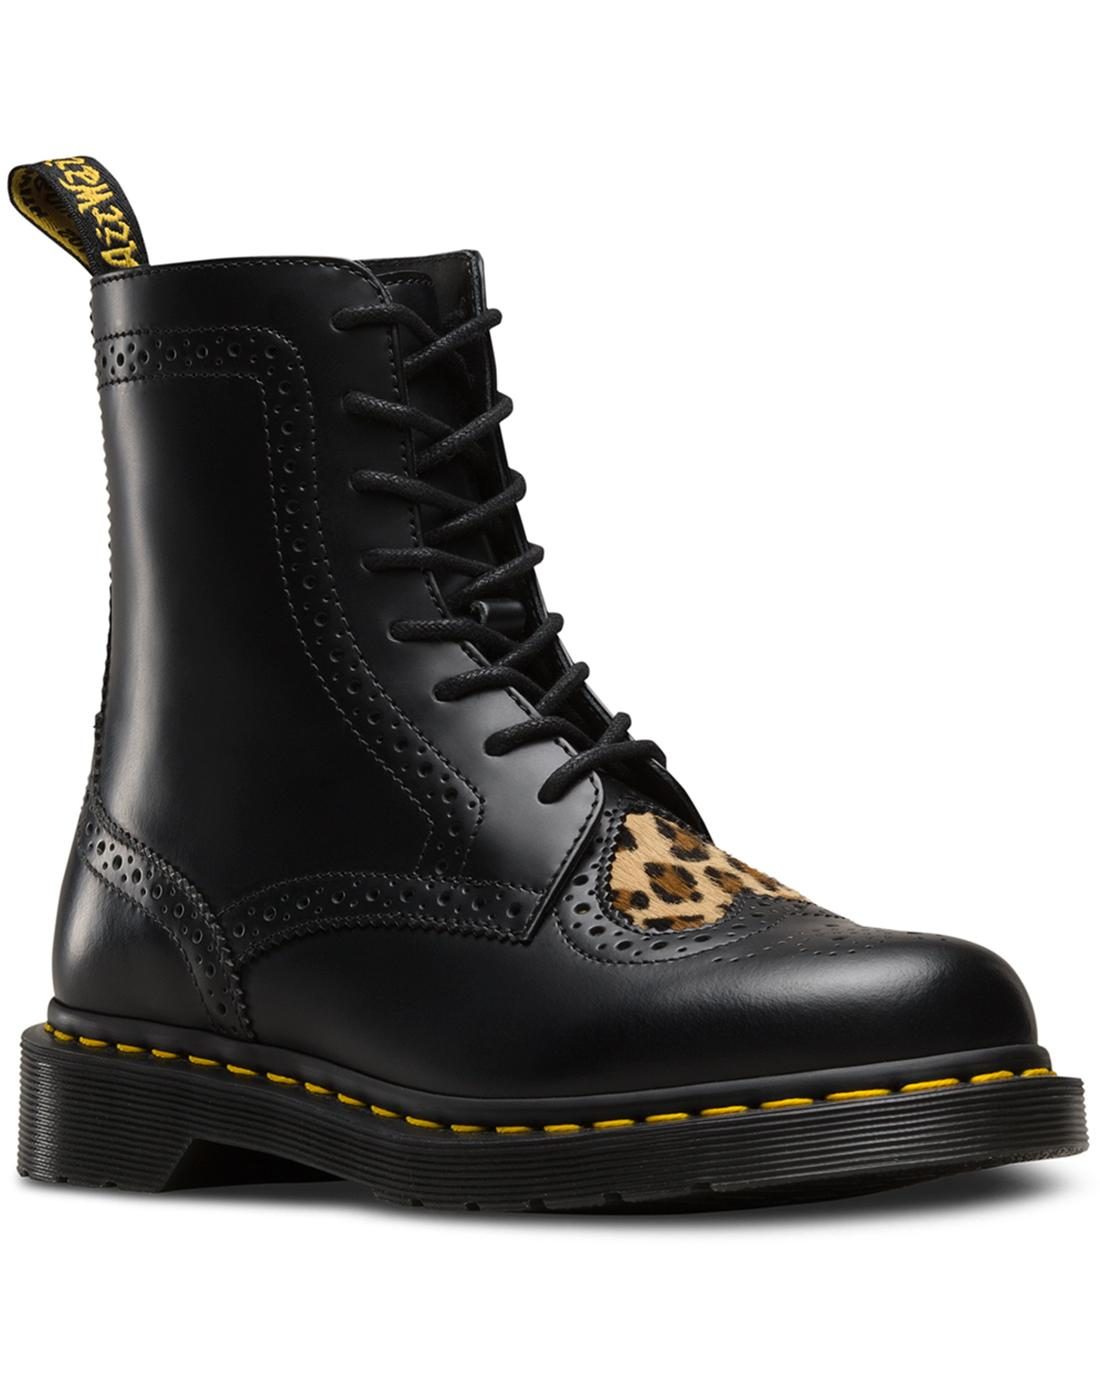 Bentley II Heart DR MARTENS Leopard Brogue Boots